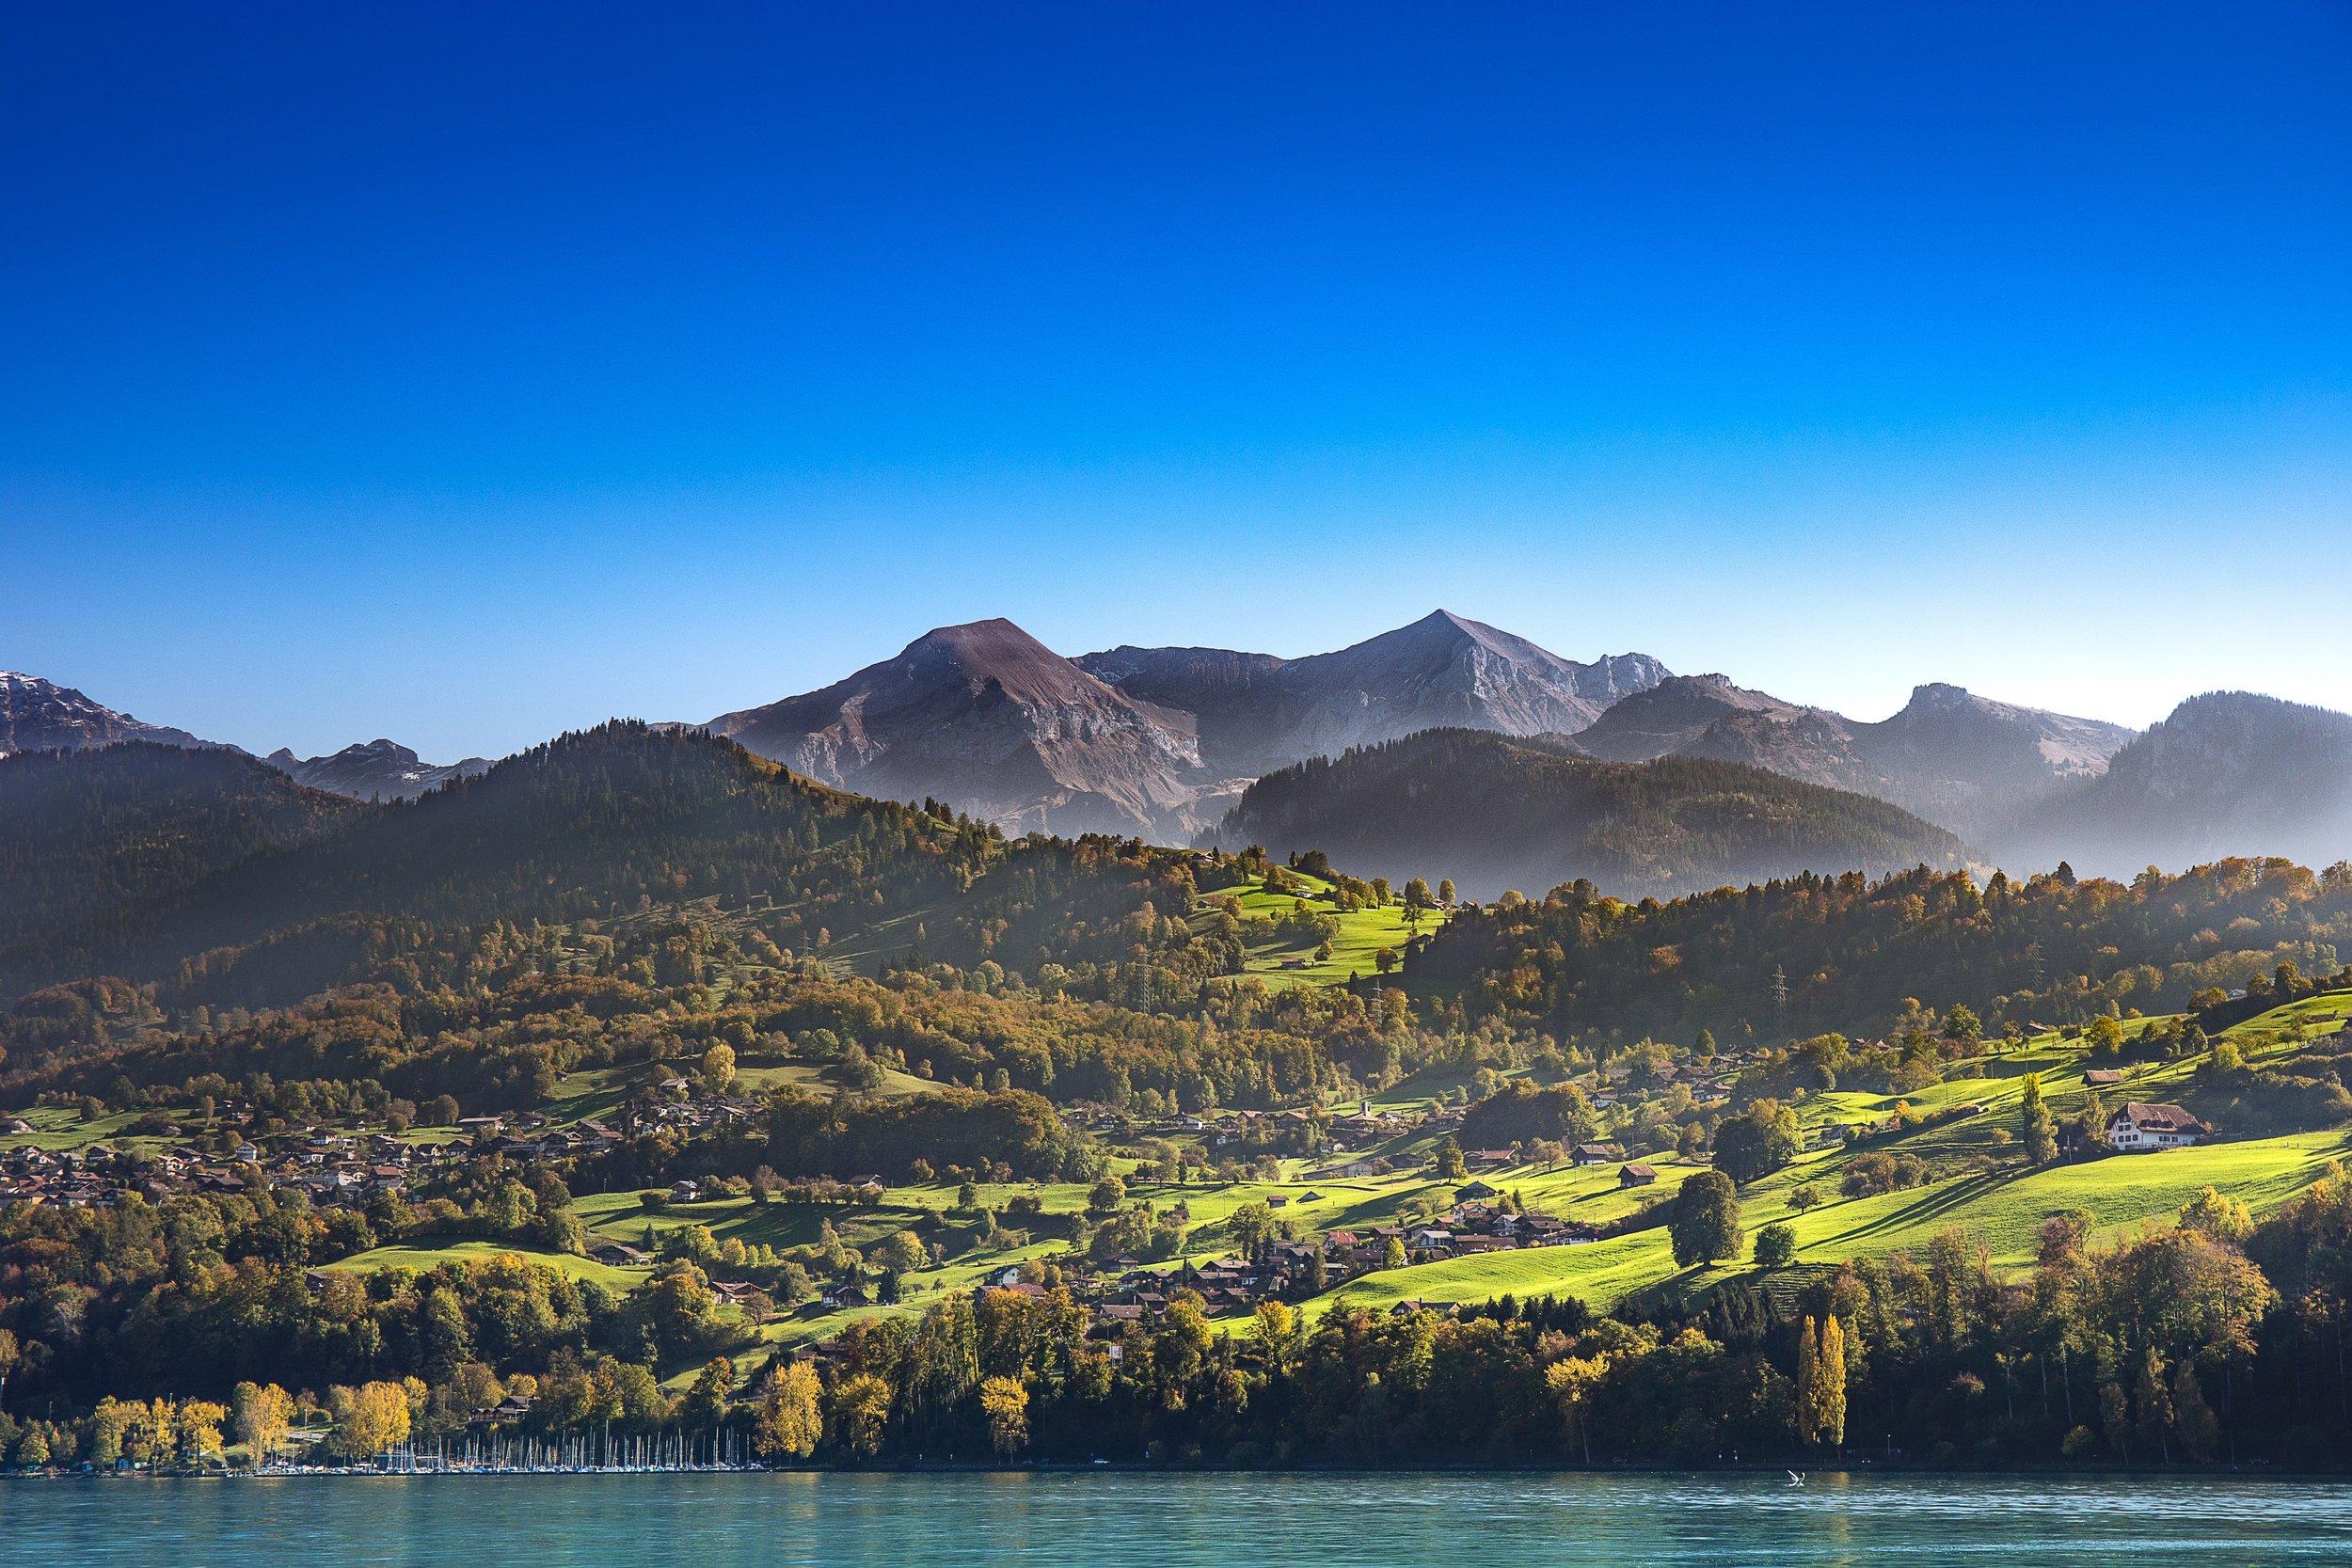 alps-environment-europe-2026454.jpg